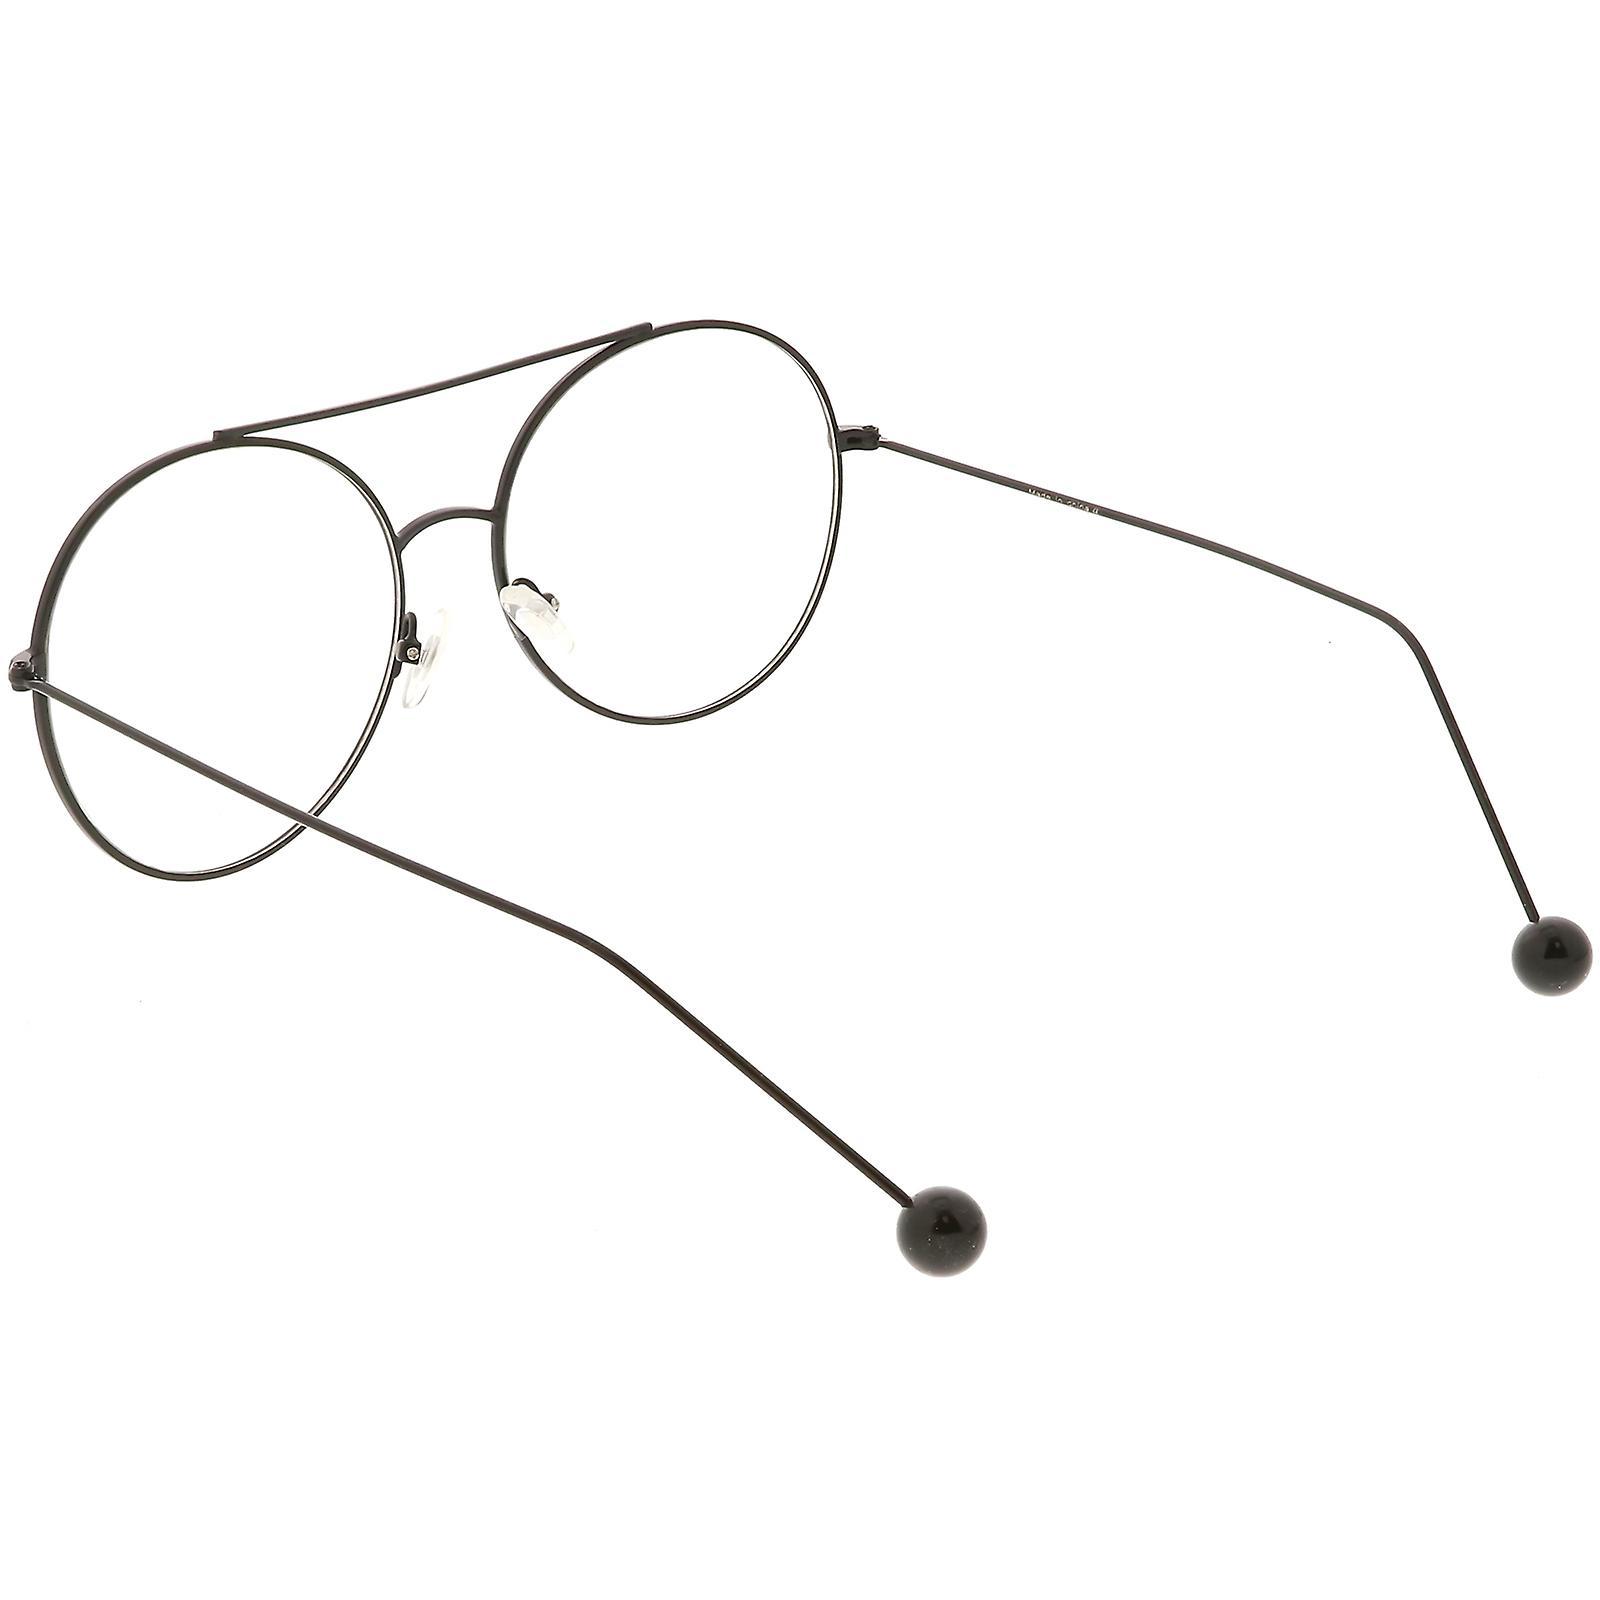 48717ed315 Premium Oversize Round Eyeglasses Metal Double Nose Bridge Clear Flat Lens  59mm